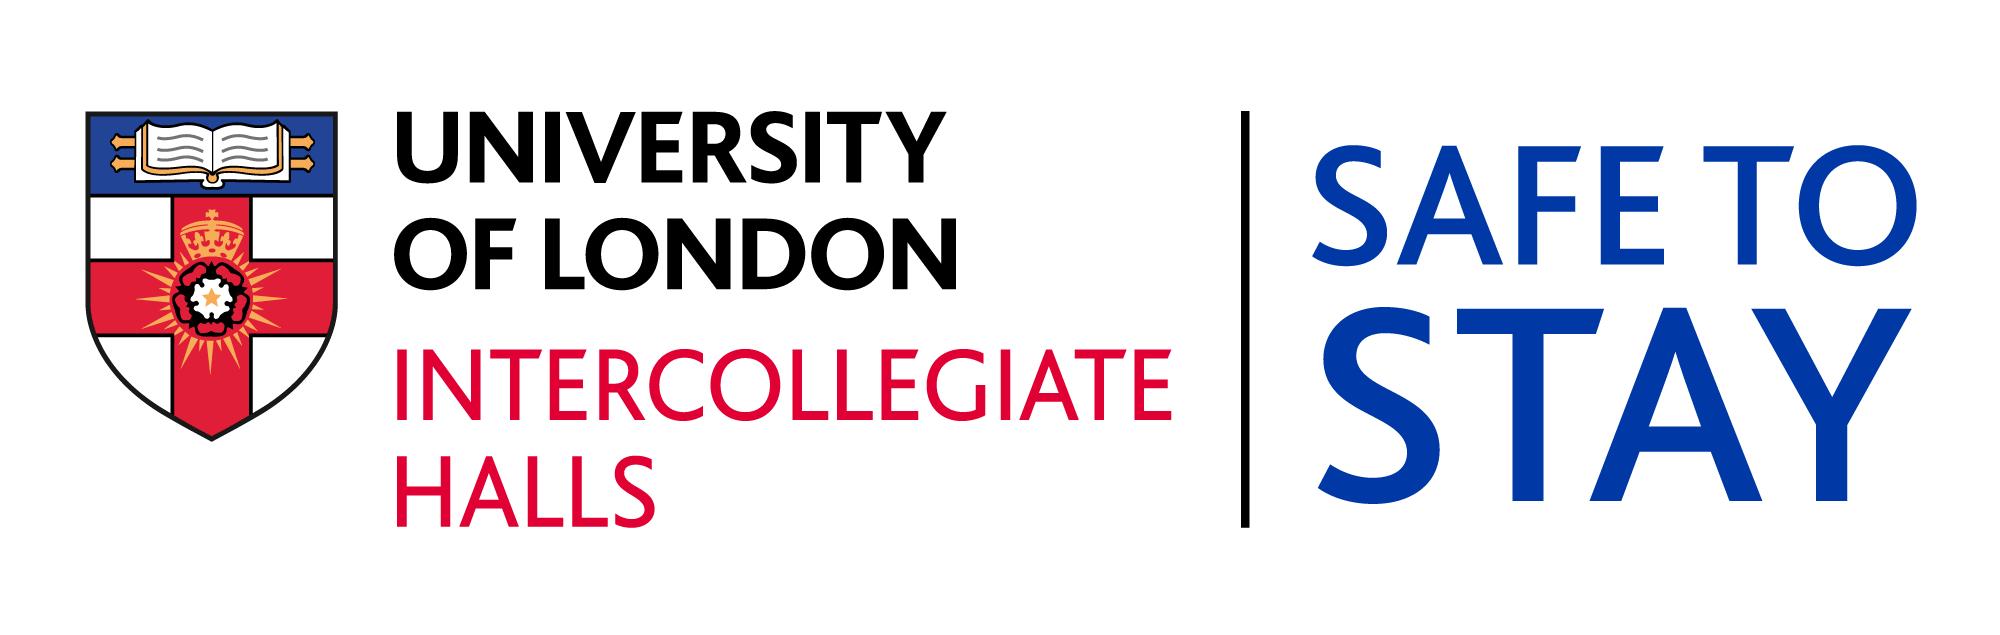 Intercollegiate Halls Safe to Stay logo